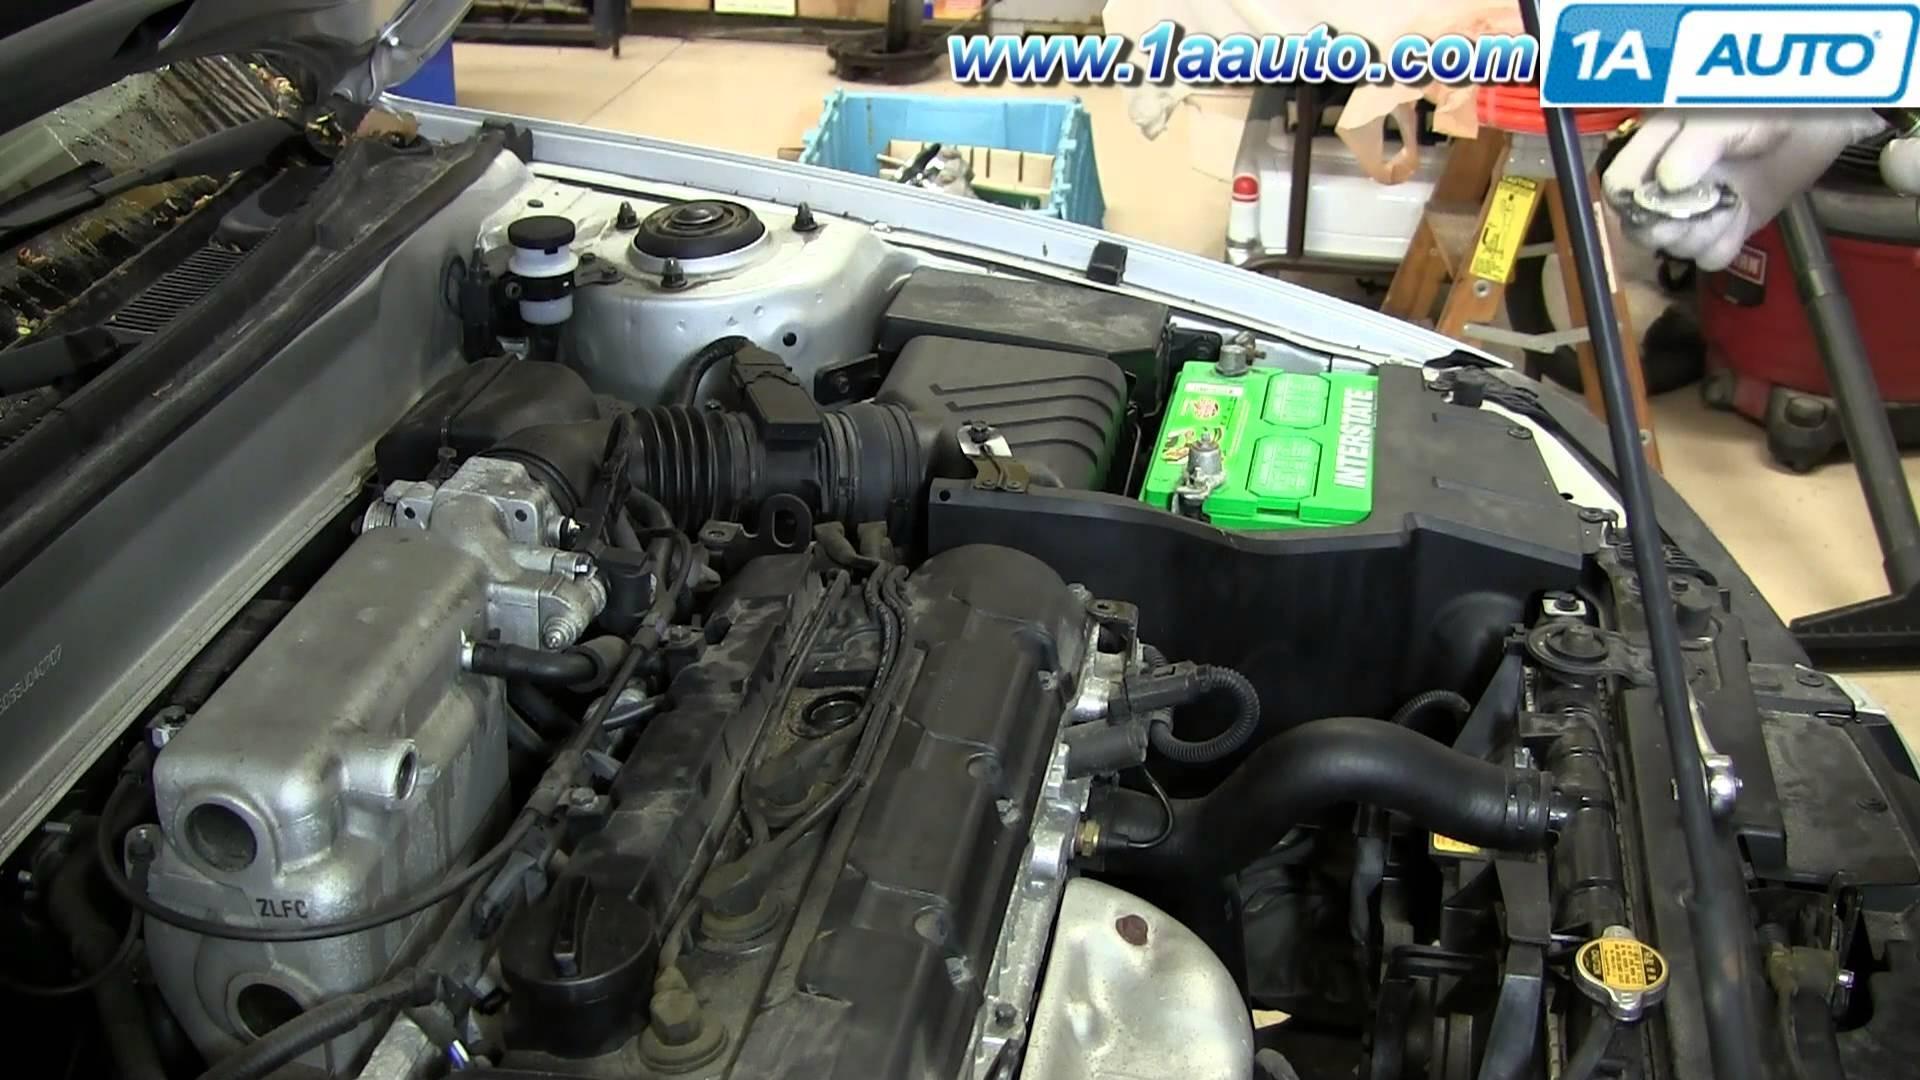 2002 Hyundai Elantra Engine Diagram How To Replace Change Install Spark Plugs 2001 06